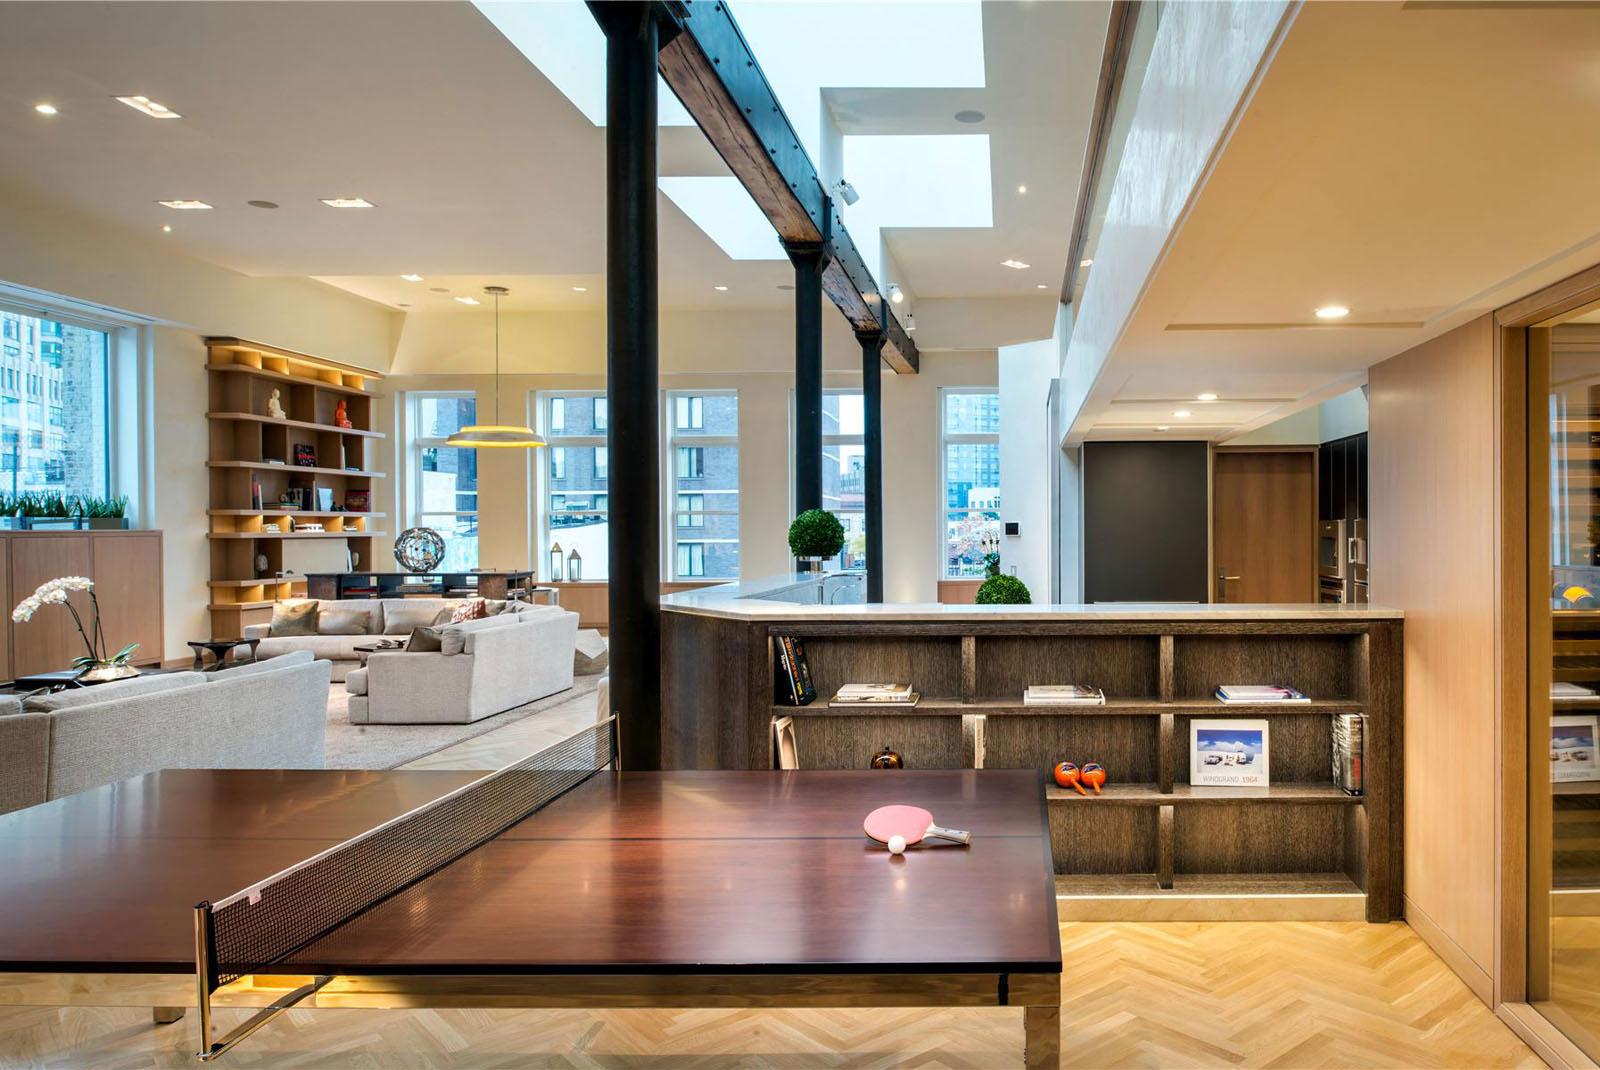 Minimalist Manhattan penthouse with glass exterior walls